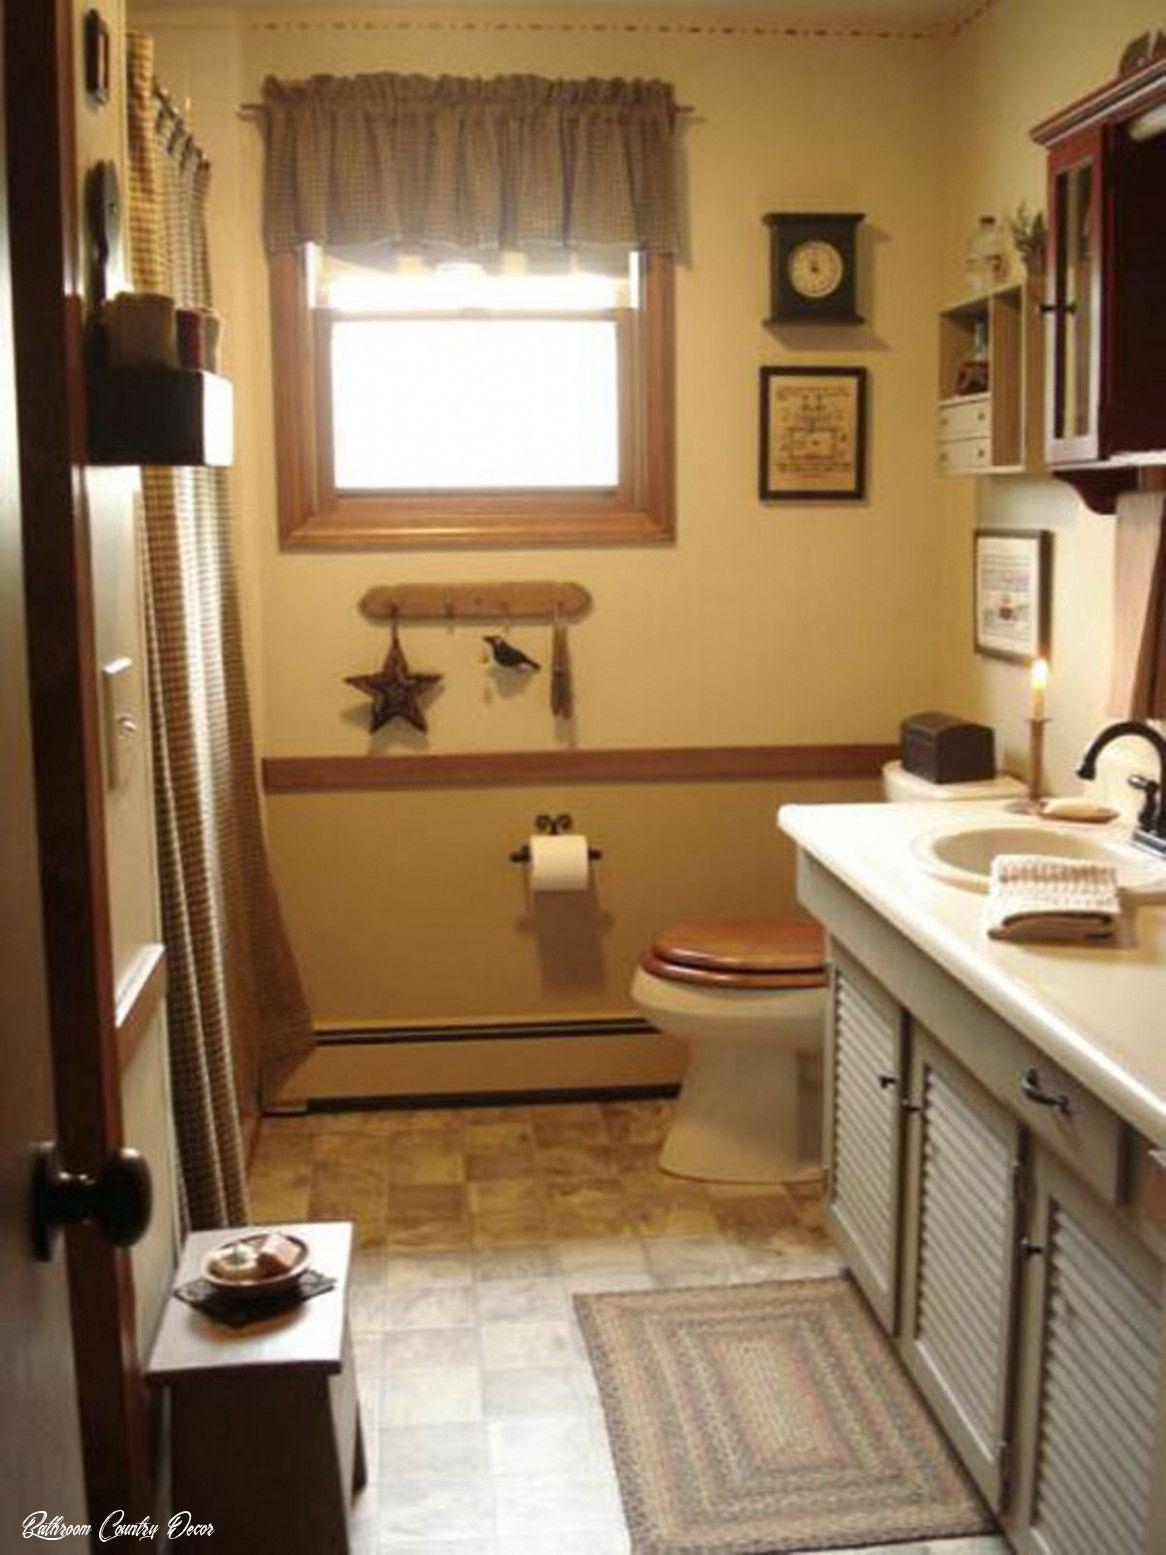 Photo of 12+ Top Bathroom Country Decor